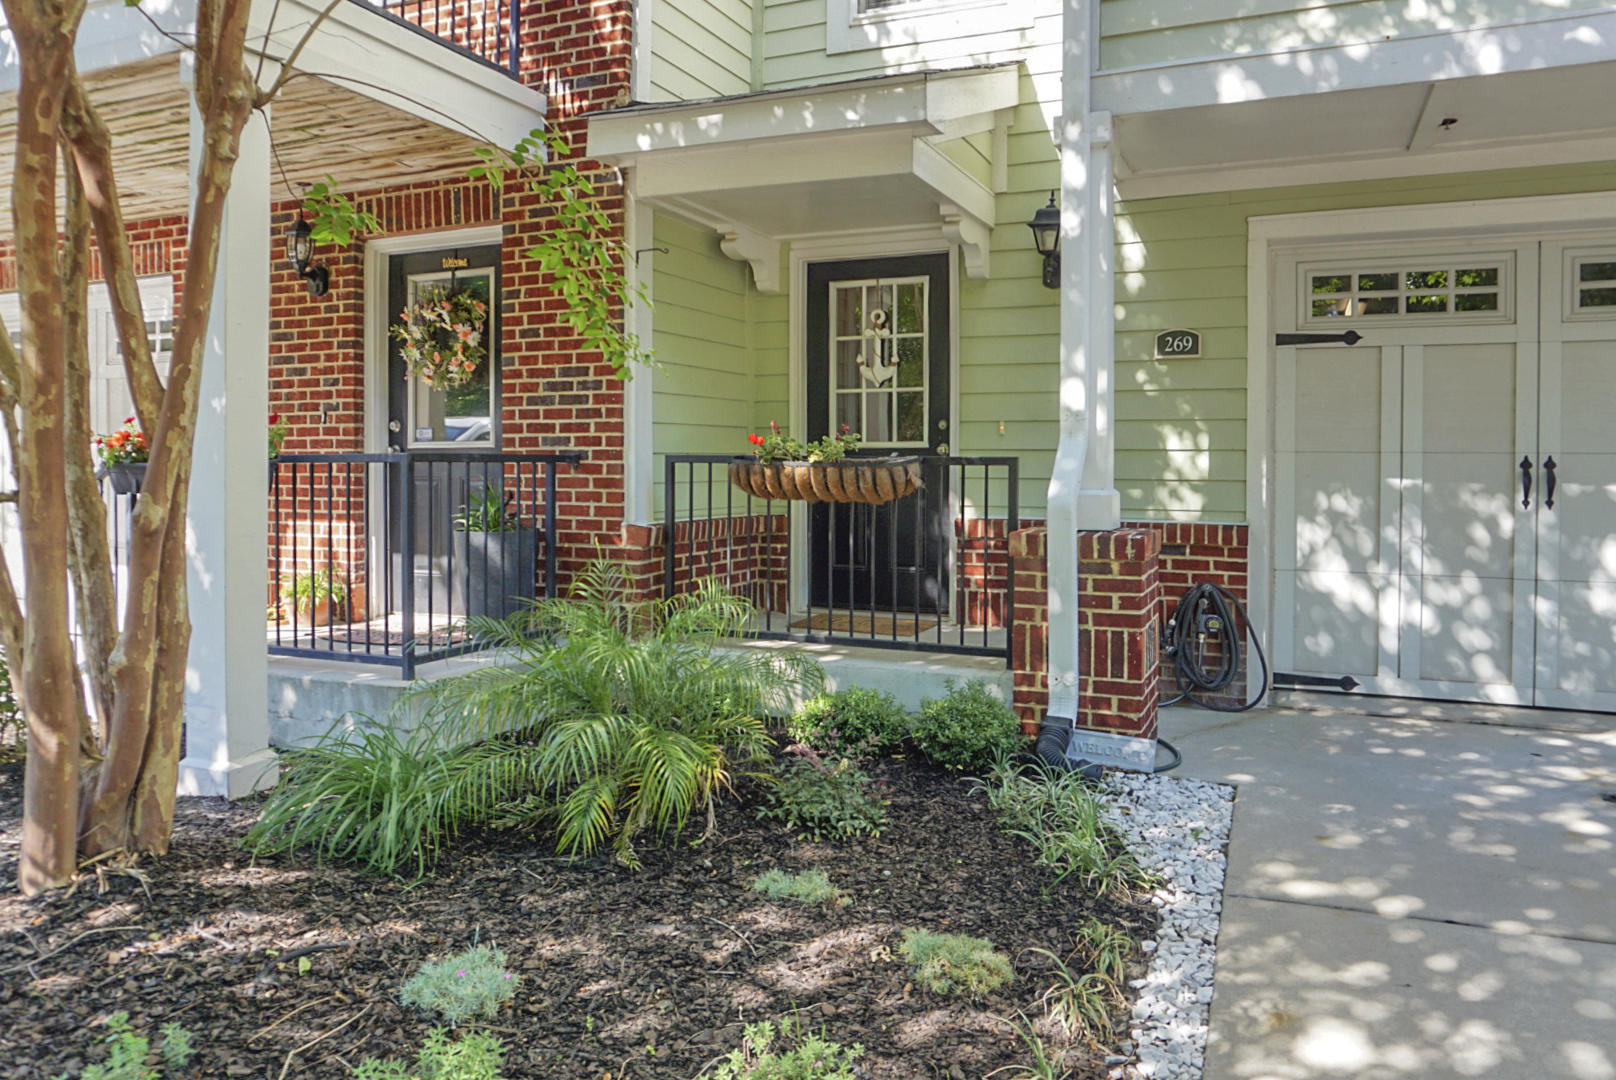 Etiwan Pointe Homes For Sale - 269 Etiwan Pointe, Mount Pleasant, SC - 3